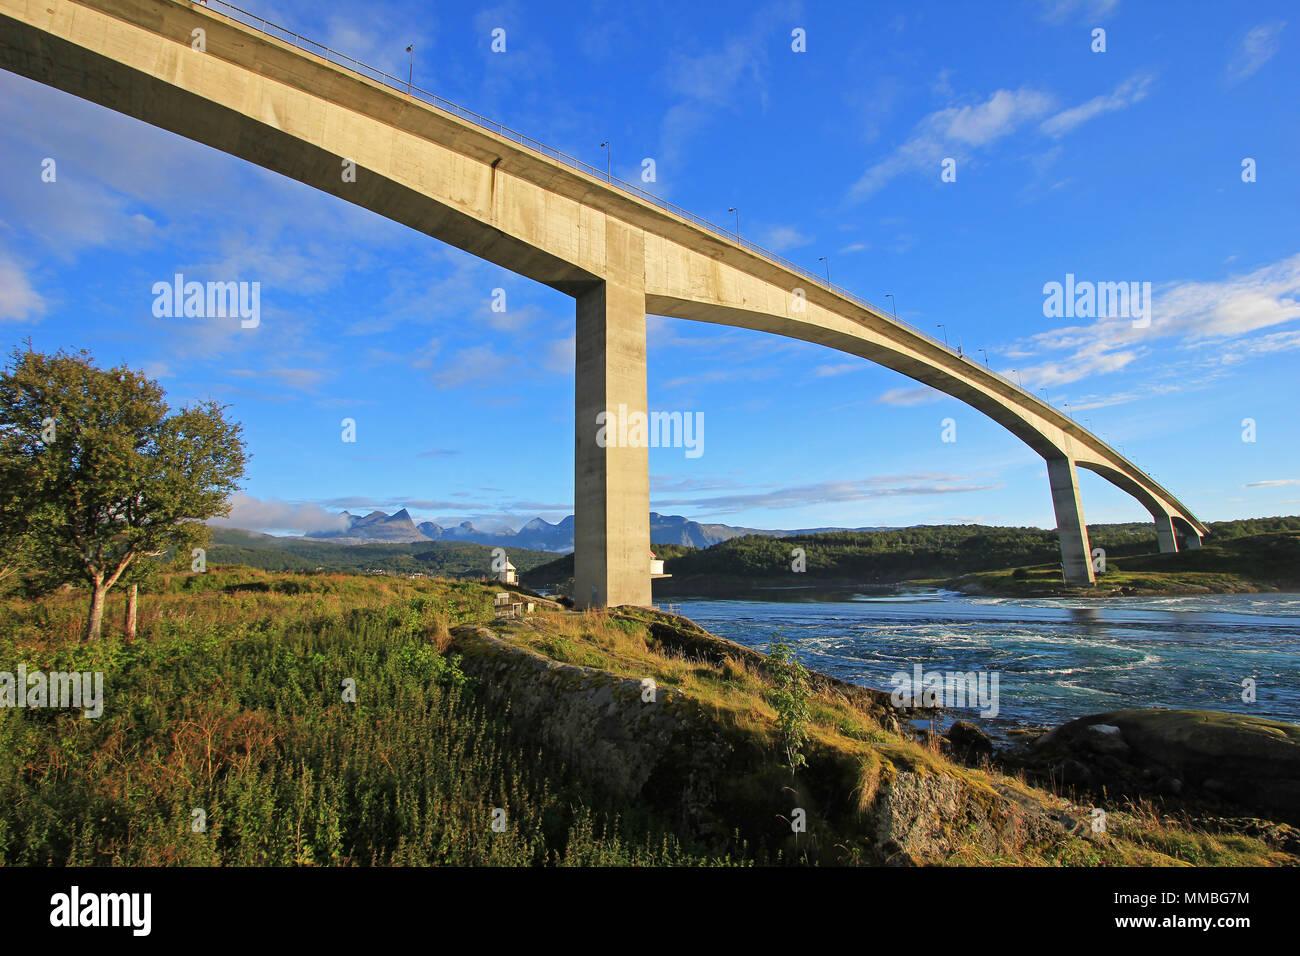 Bridge over the fjord of the whirlpools of the maelstrom of Saltstraumen, Nordland, Norway, Scandinavia Stock Photo